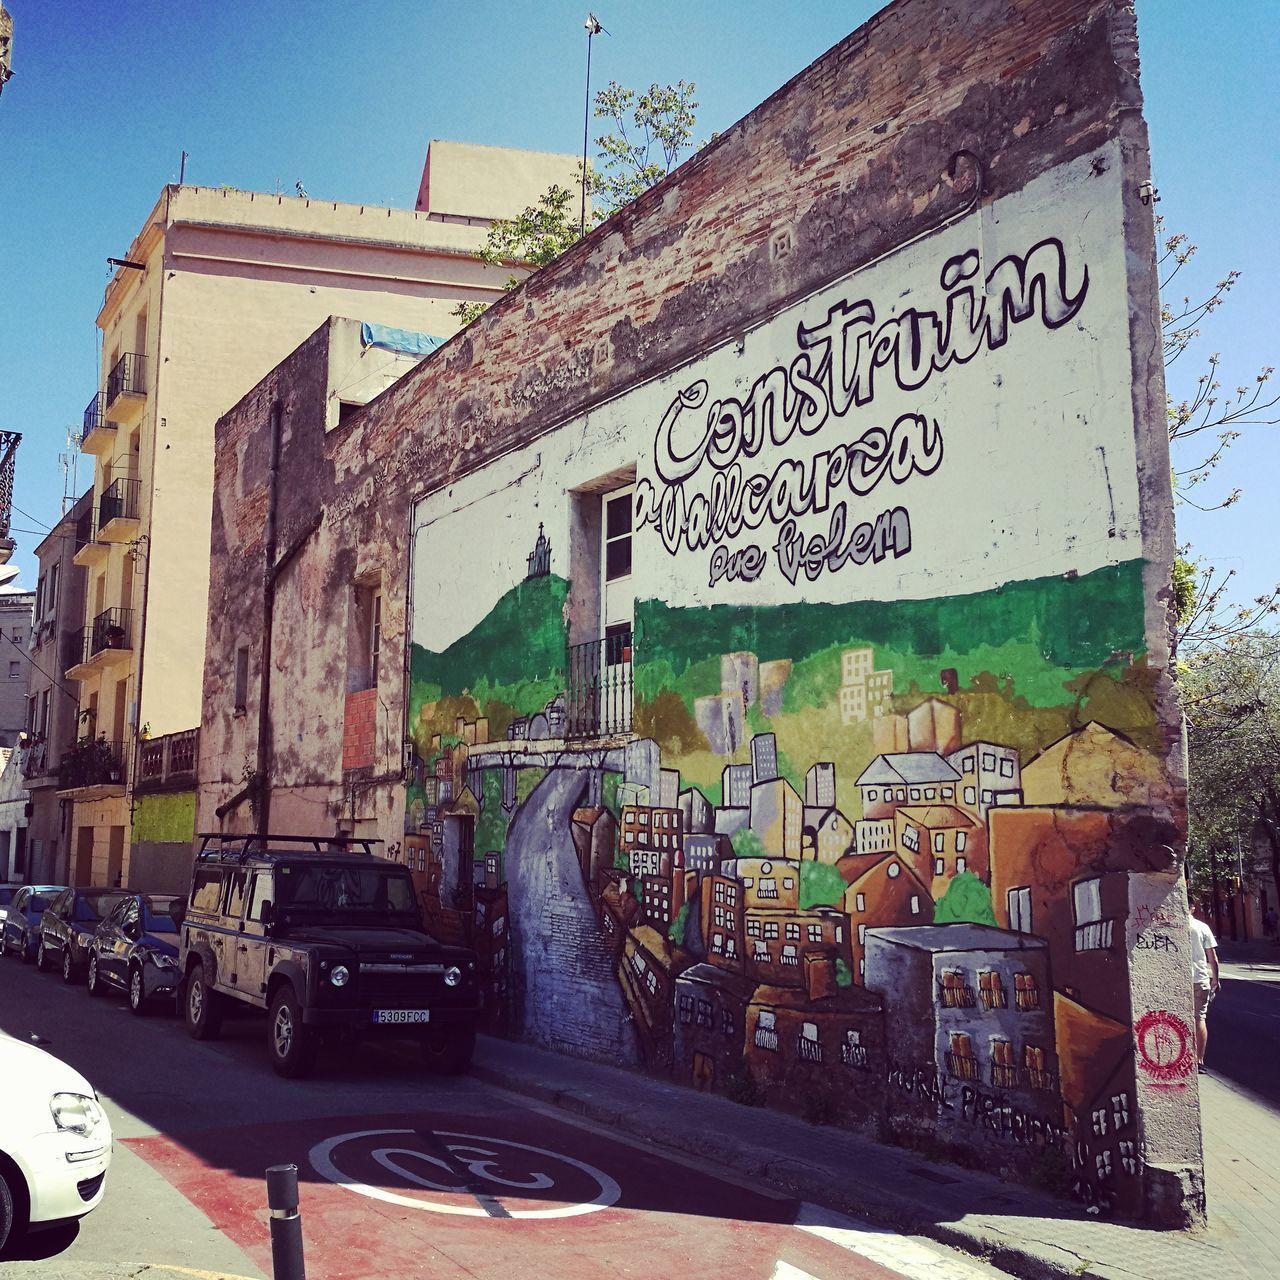 1Tag in Barcelona. EyeEmBestPics Grafiti Art Architecture Outdoors Barcelona Streets